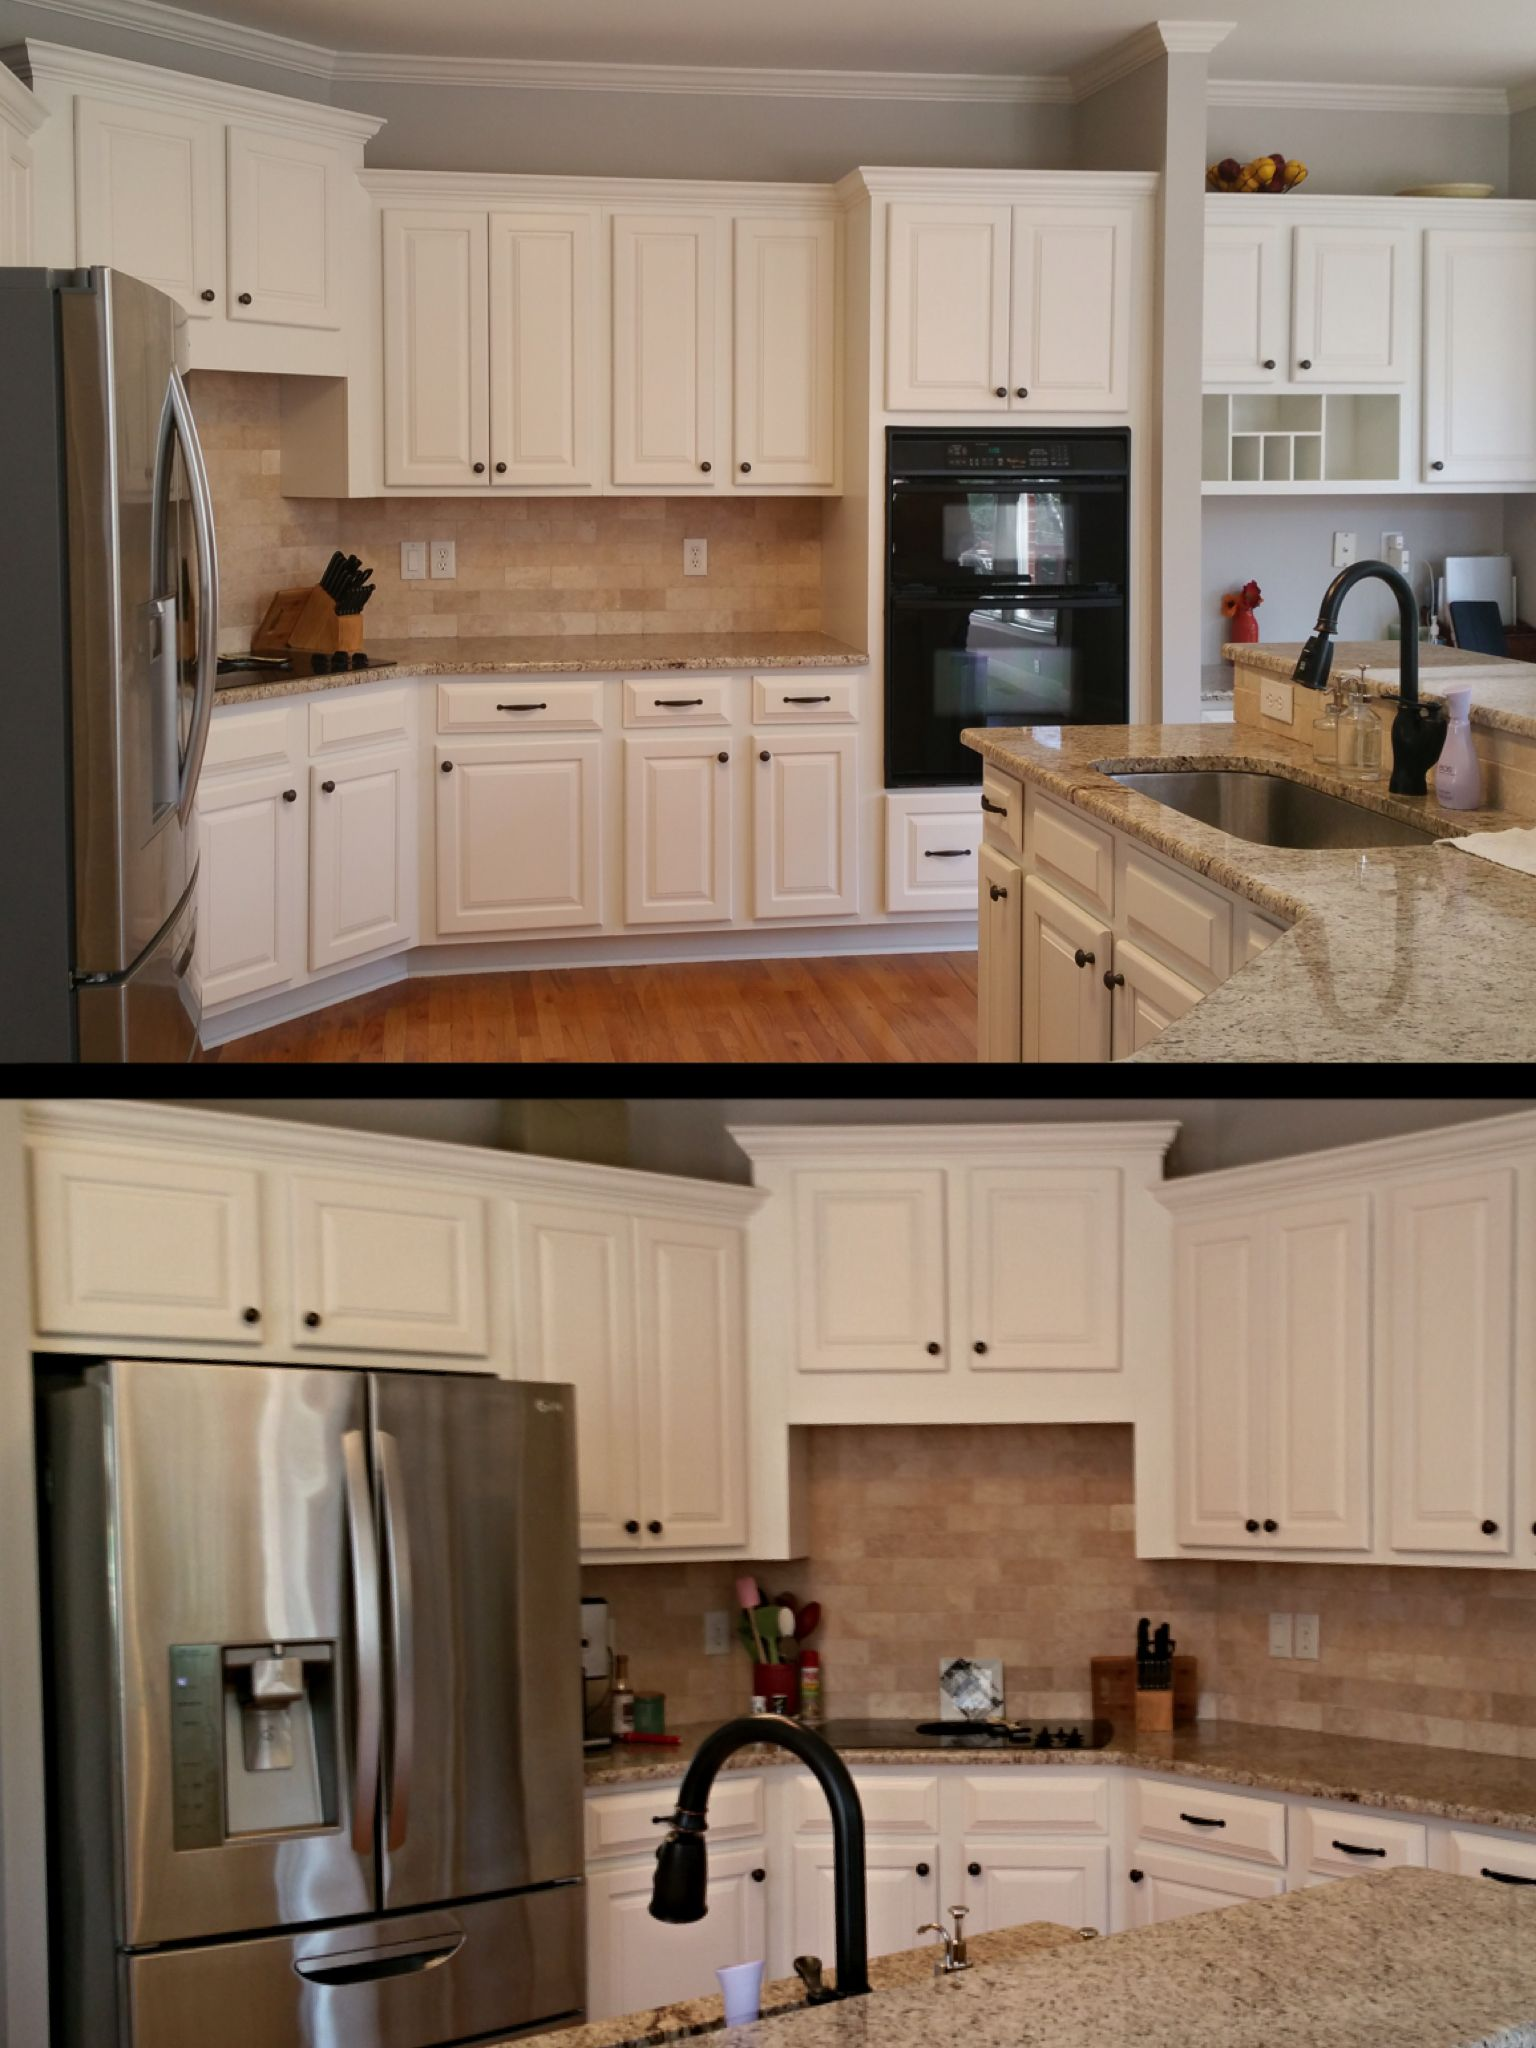 Atractivo Mueble De Cocina Pintores Barrie Ilustración - Ideas para ...